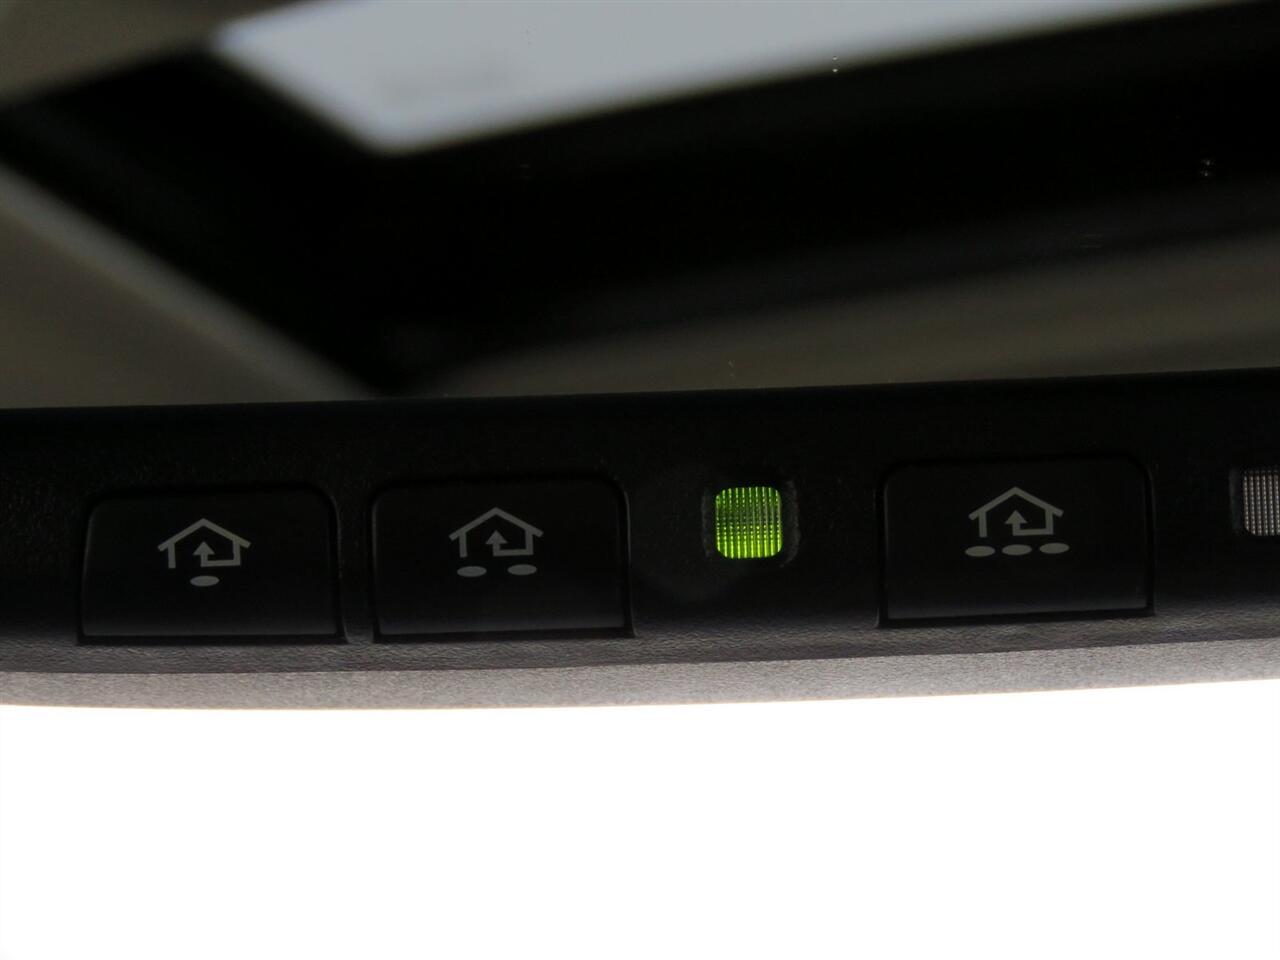 2012 Infiniti QX56